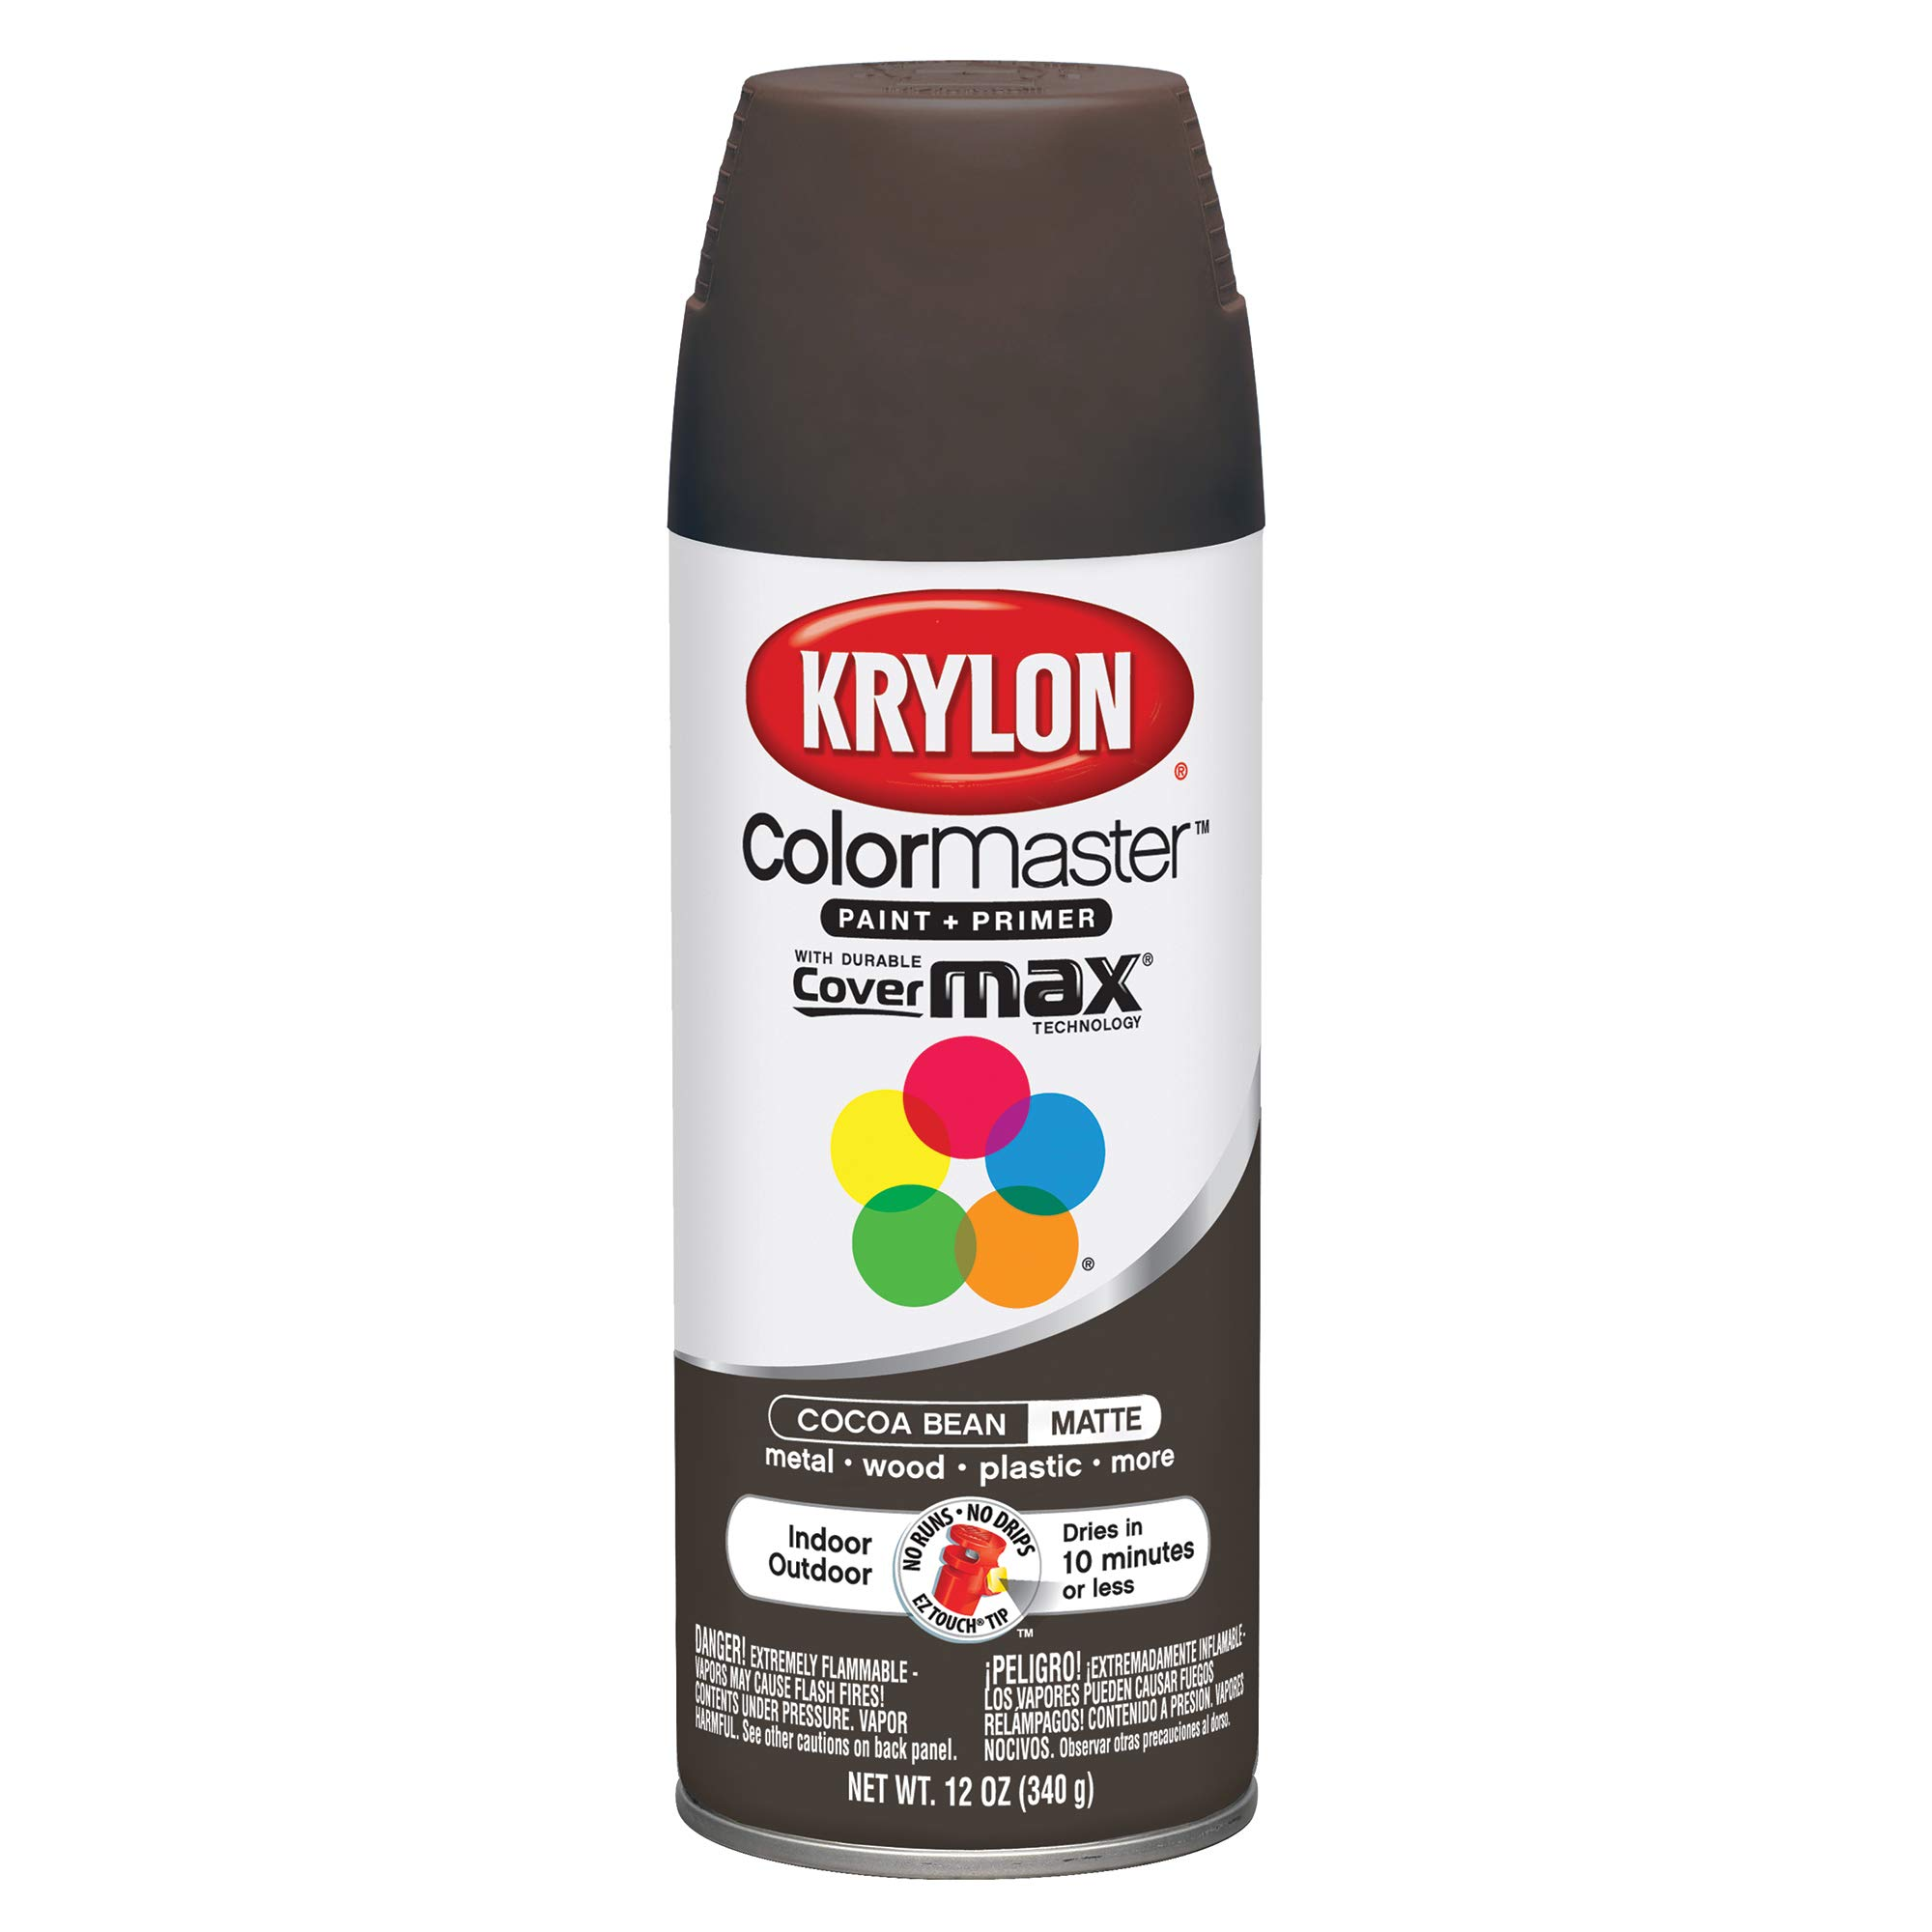 Krylon K05359102 ColorMaster Primer Aerosol Paints Cocoa Bean